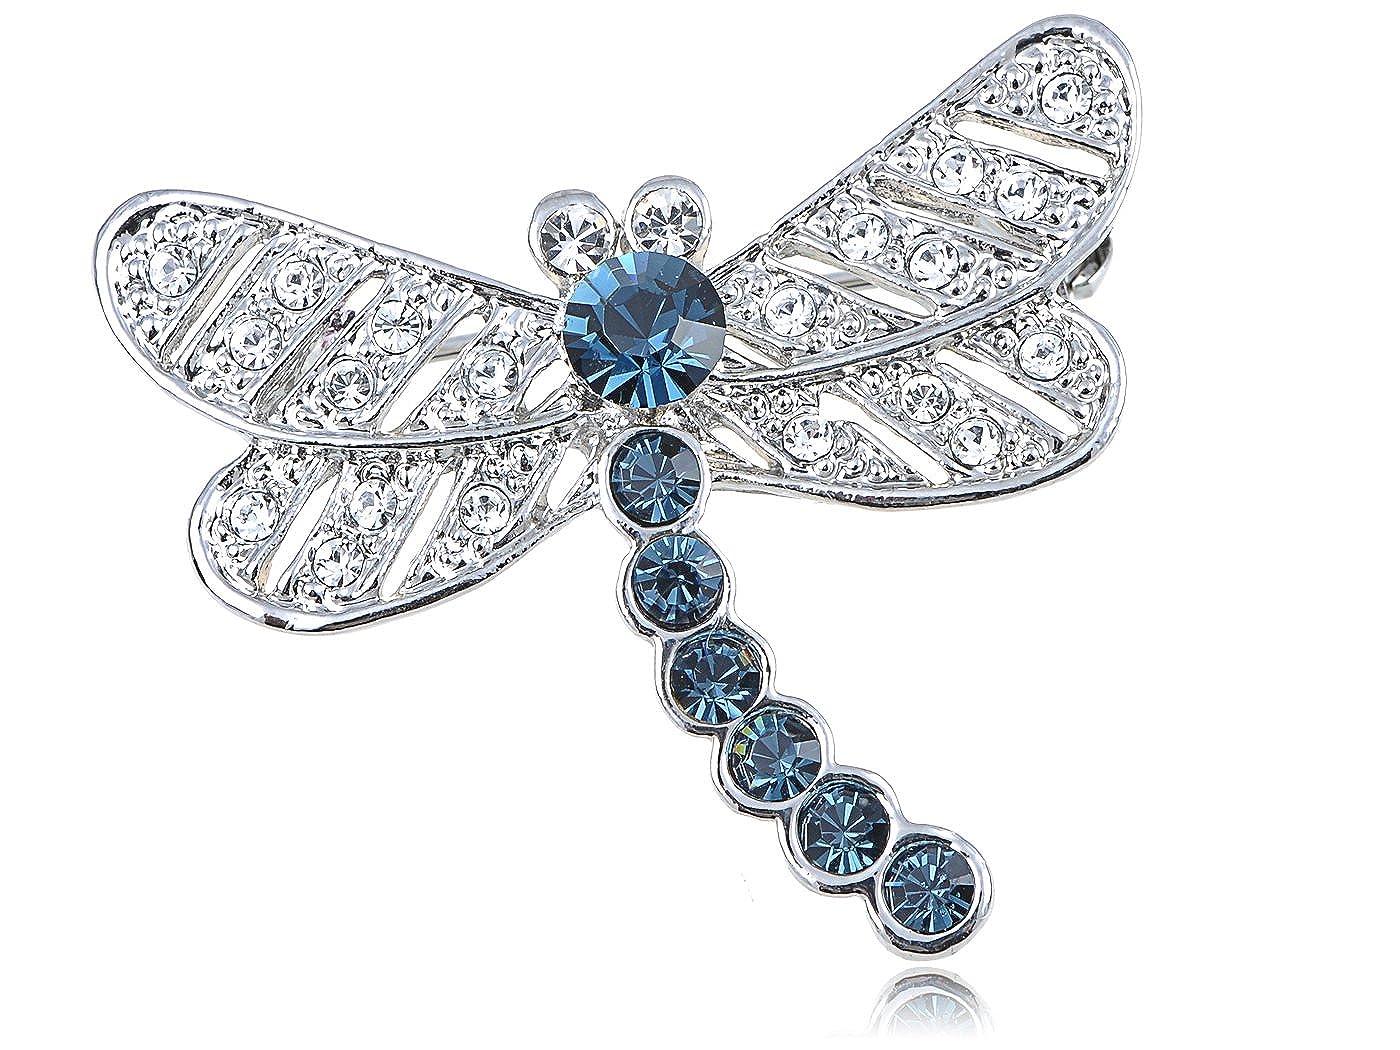 ea742f862af1d Alilang Swarovski Crystal Elements Captivate Sapphire Blue Petite Dragonfly  Pin Brooch